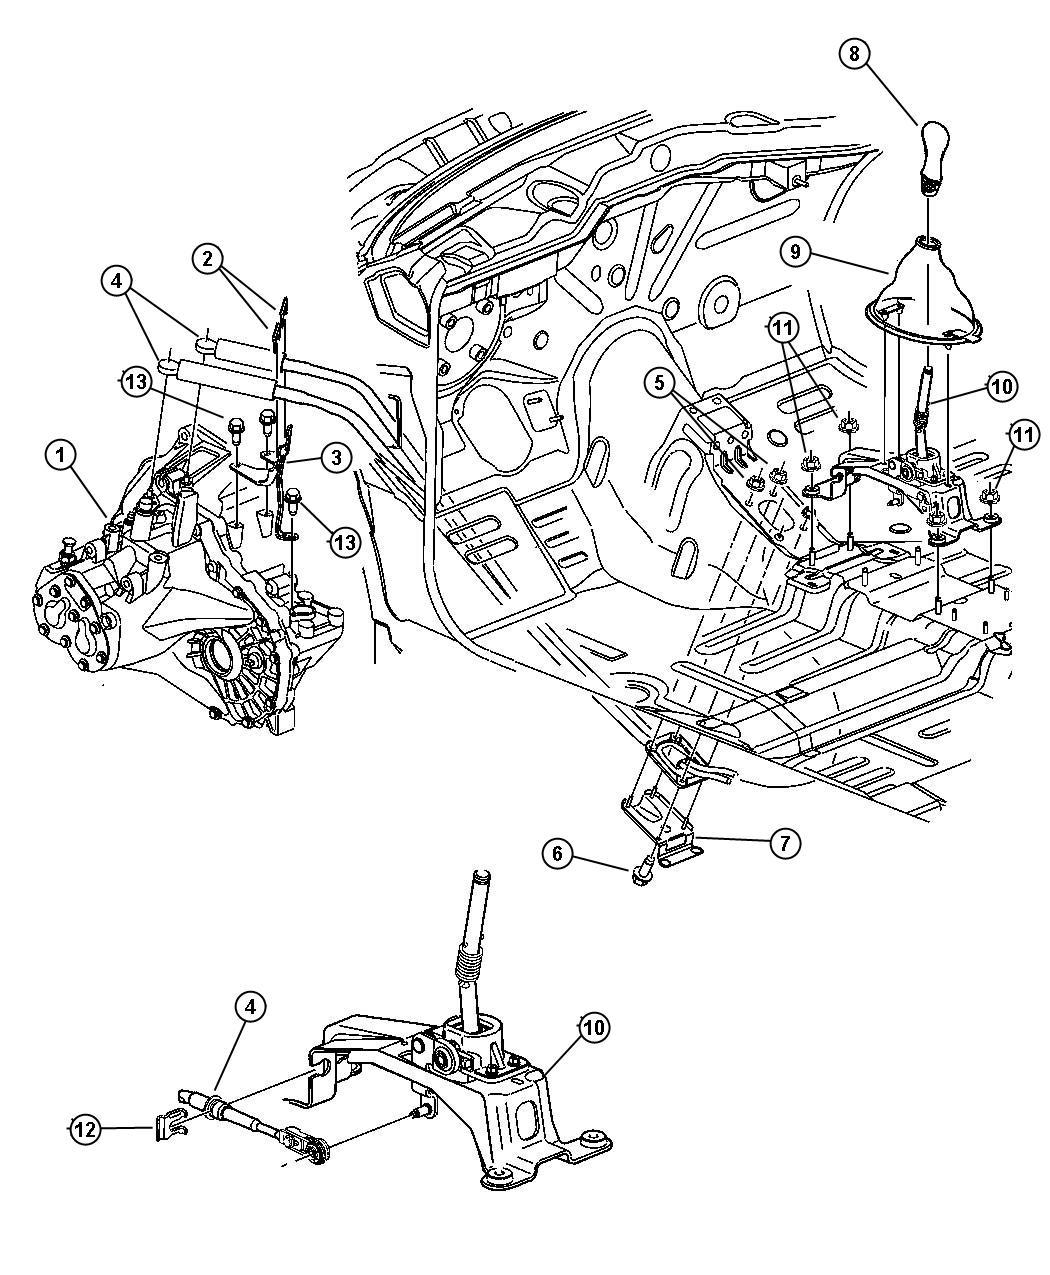 2005 Chrysler PT Cruiser Knob. Gearshift. With [cvz]. Trim